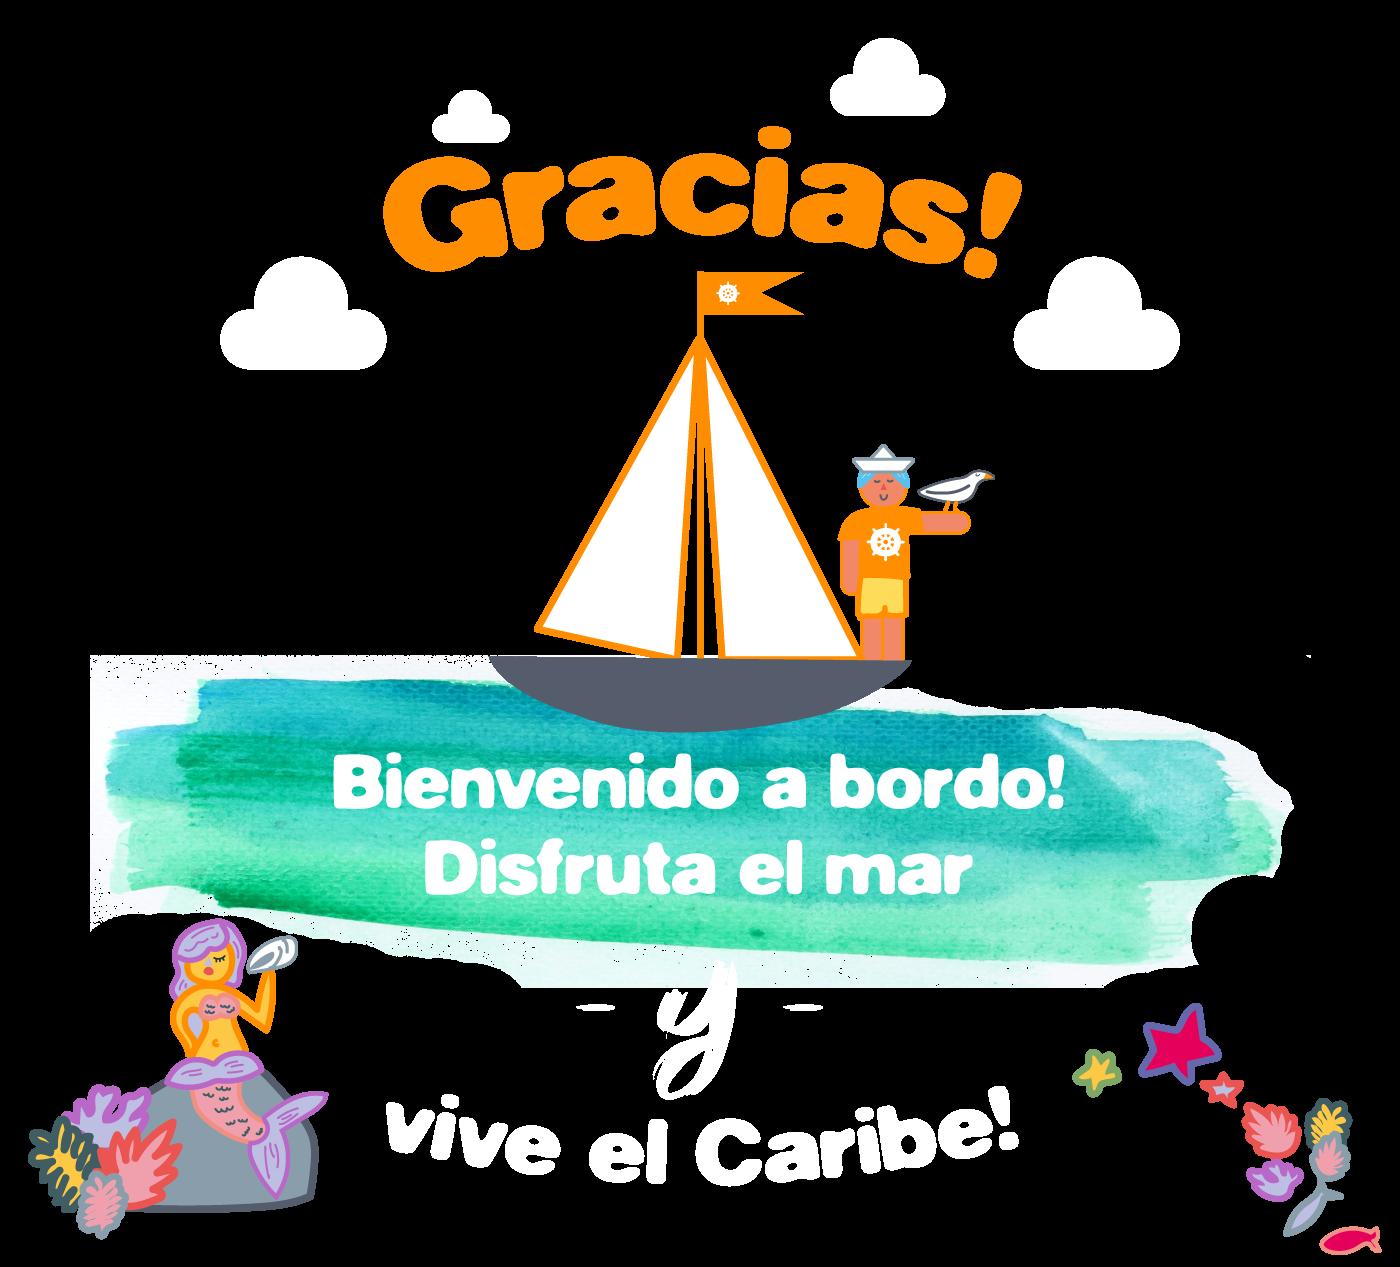 pagina-gracias-wannaboats-01